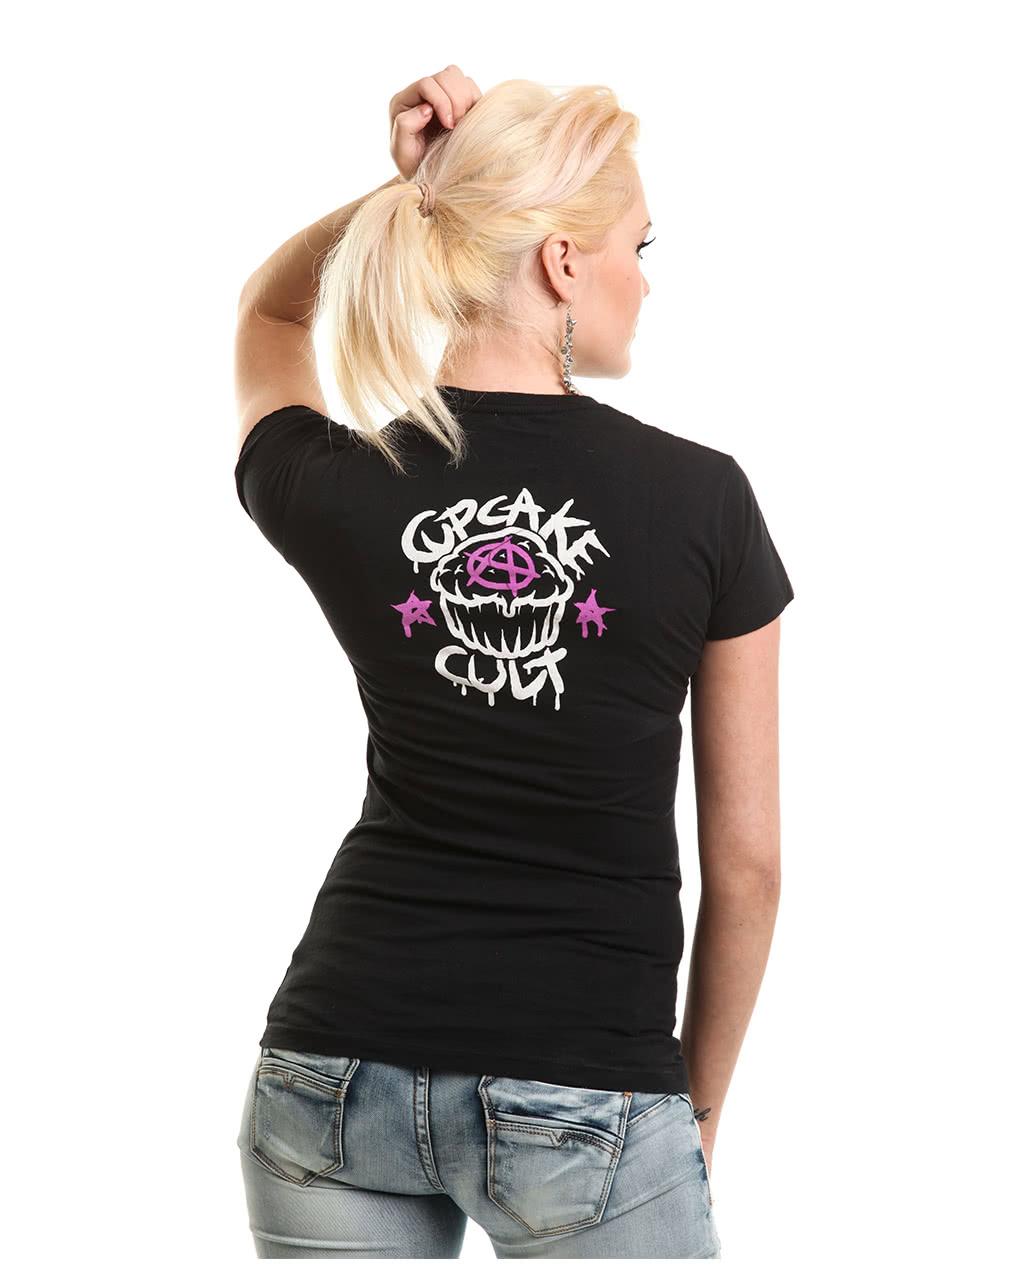 cupcake cult unicorn shirt emo fashion horror. Black Bedroom Furniture Sets. Home Design Ideas